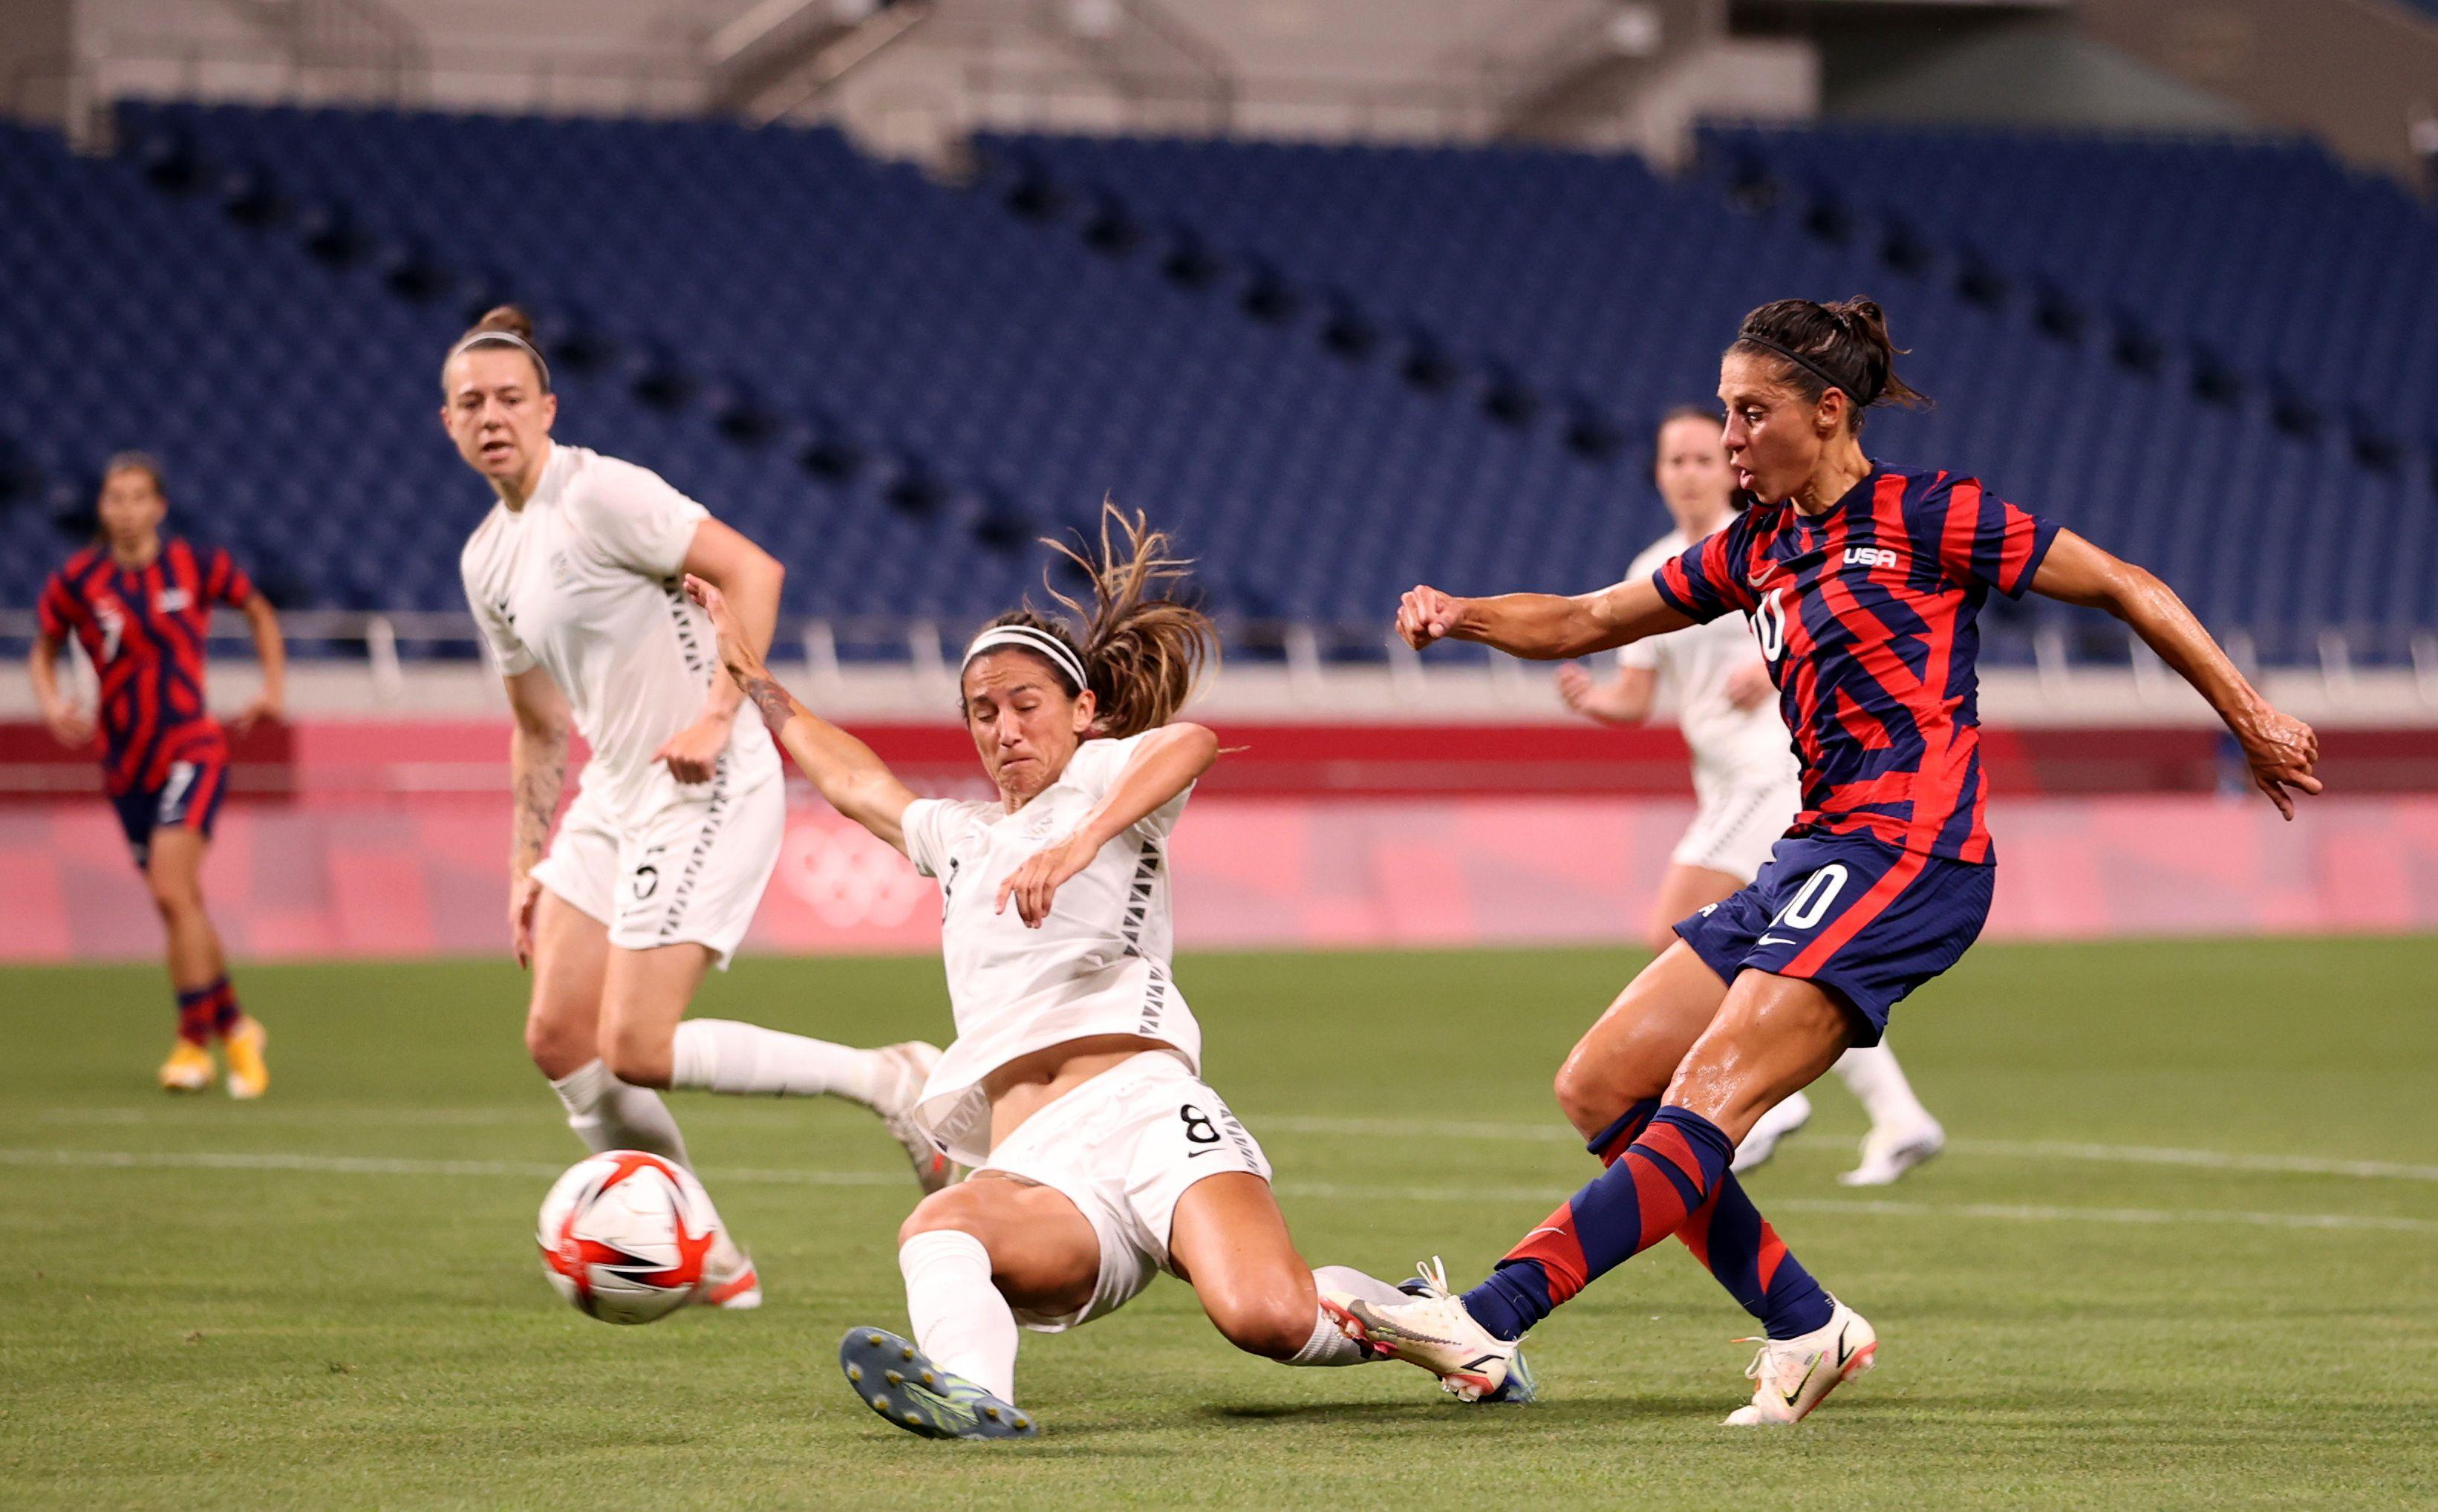 Tokyo 2020 Olympics - Soccer Football - Women - Group G - New Zealand v United States - Saitama Stadium, Saitama, Japan - July 24, 2021. Carli Lloyd of the United States shoots at goal REUTERS/Molly Darlington